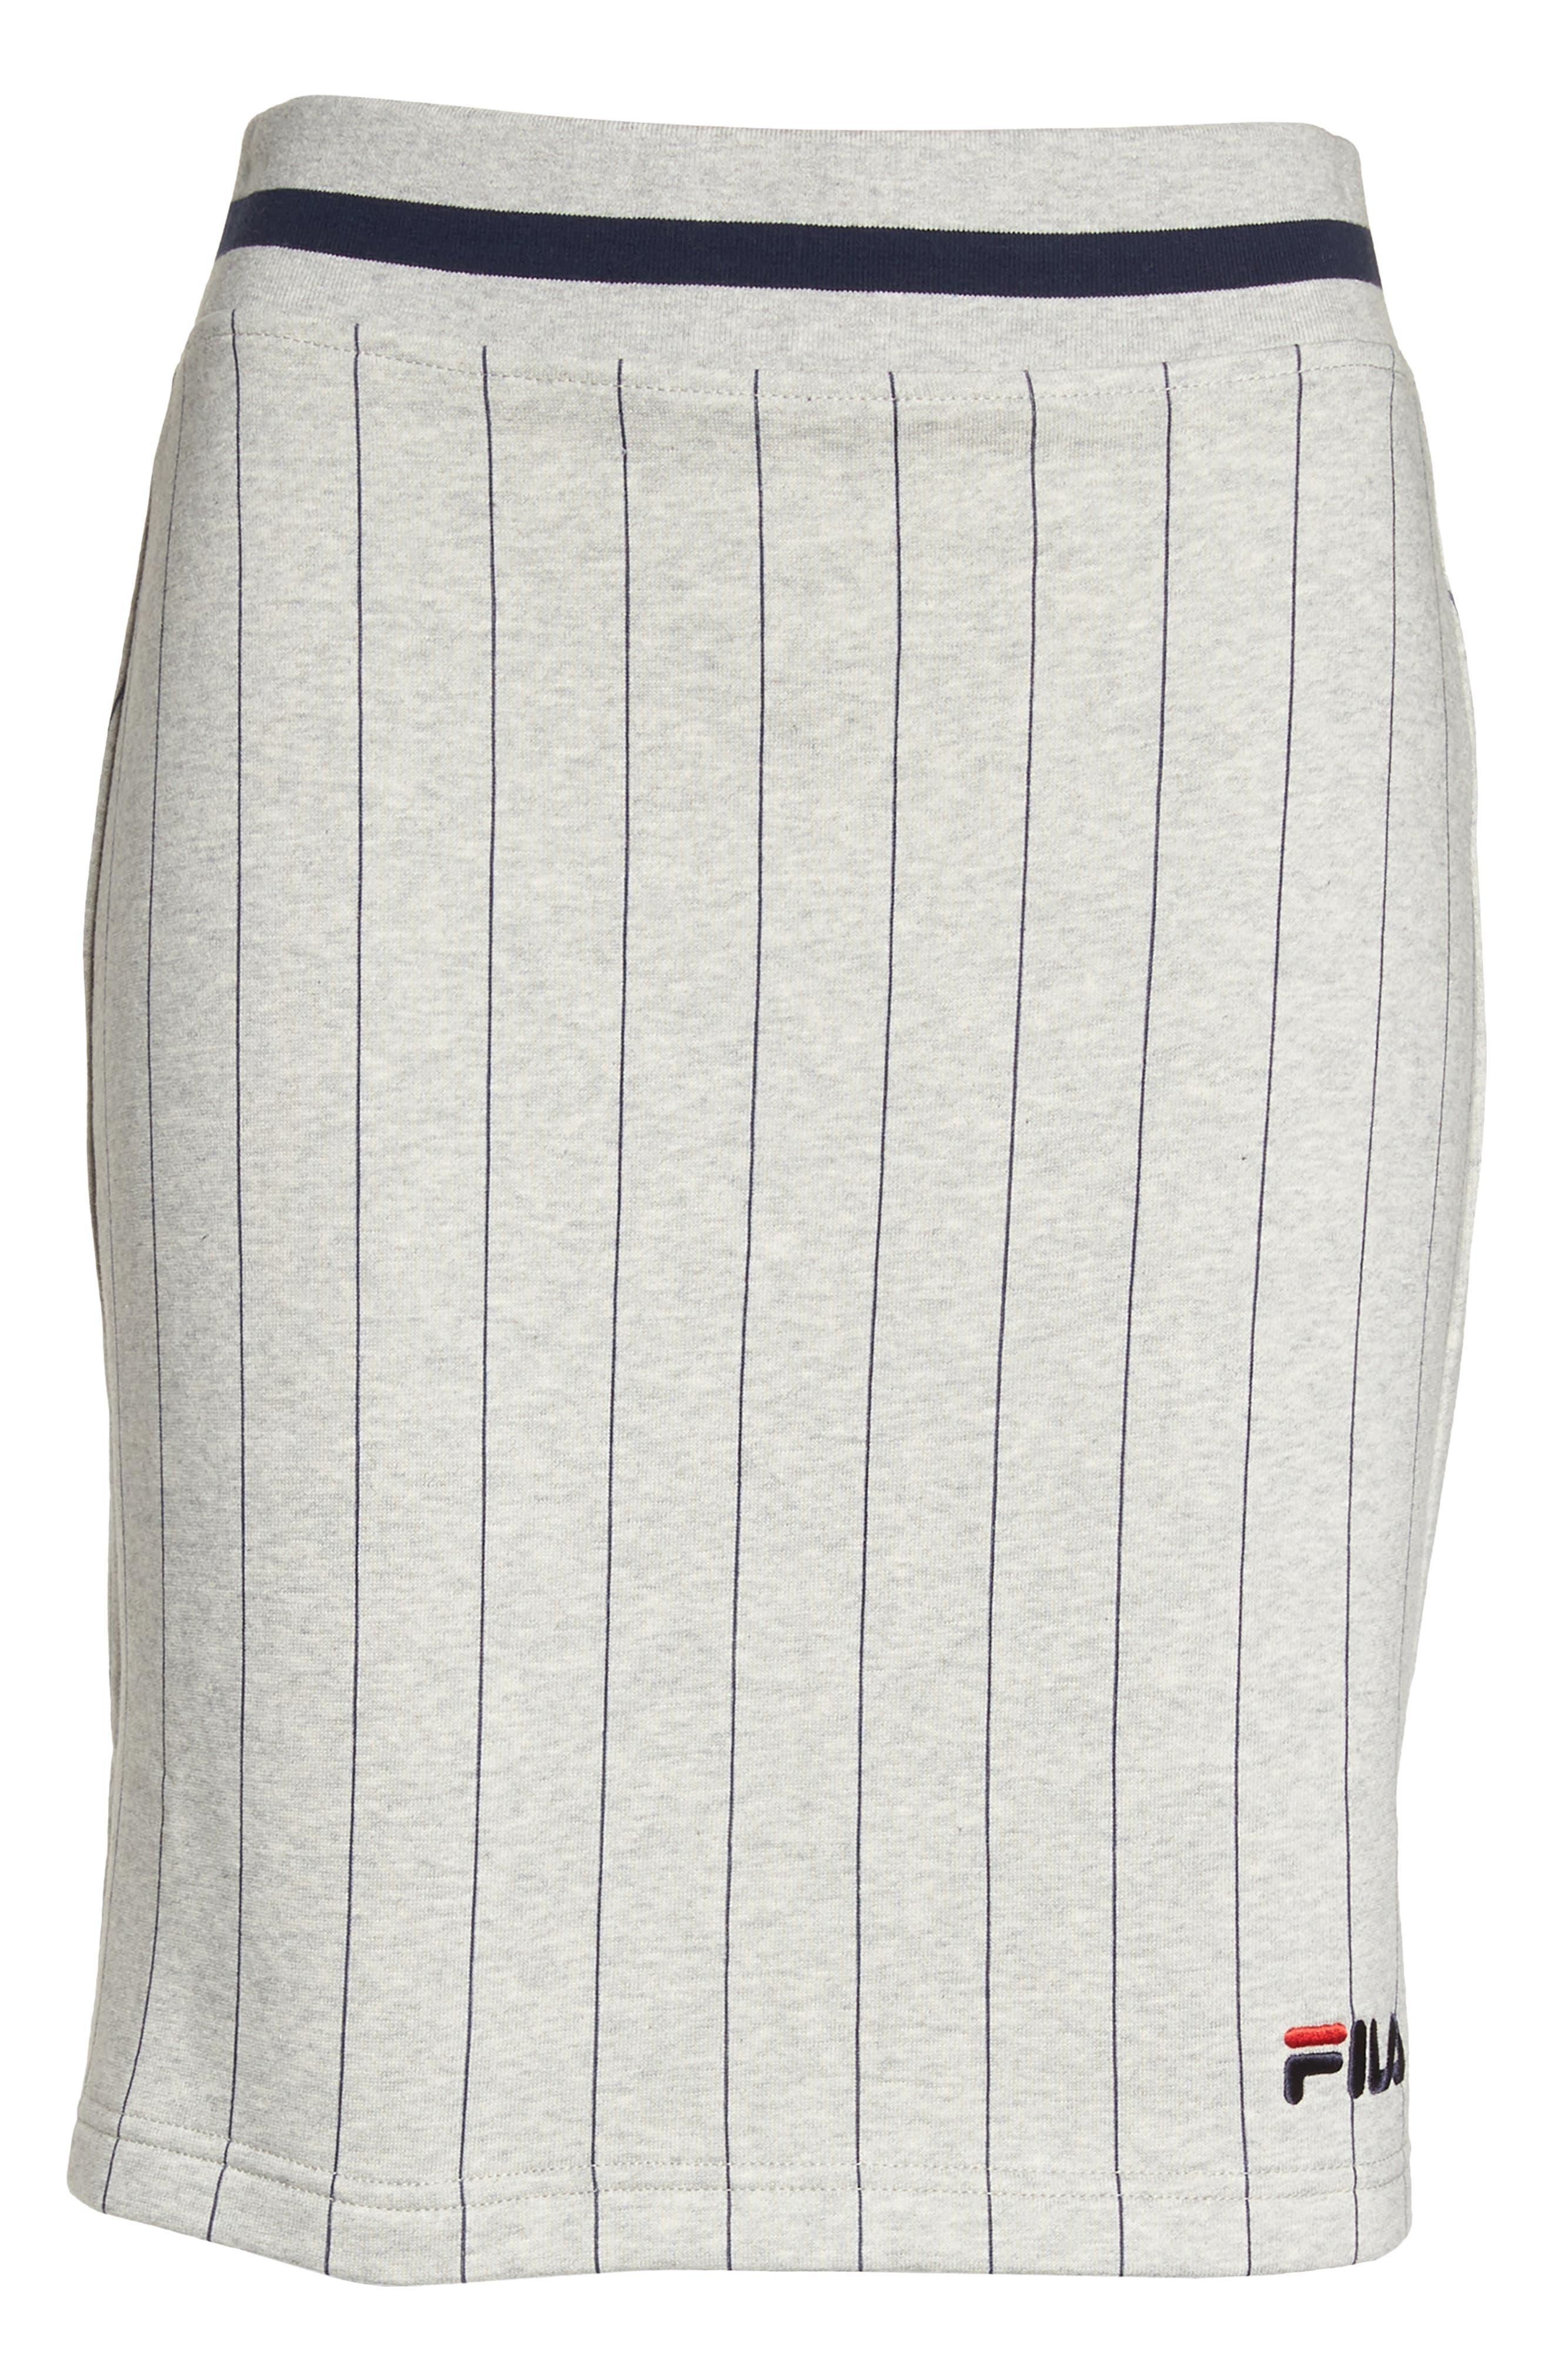 Francesca Pinstripe Skirt,                             Alternate thumbnail 8, color,                             Light Grey Marl/ Peacoat